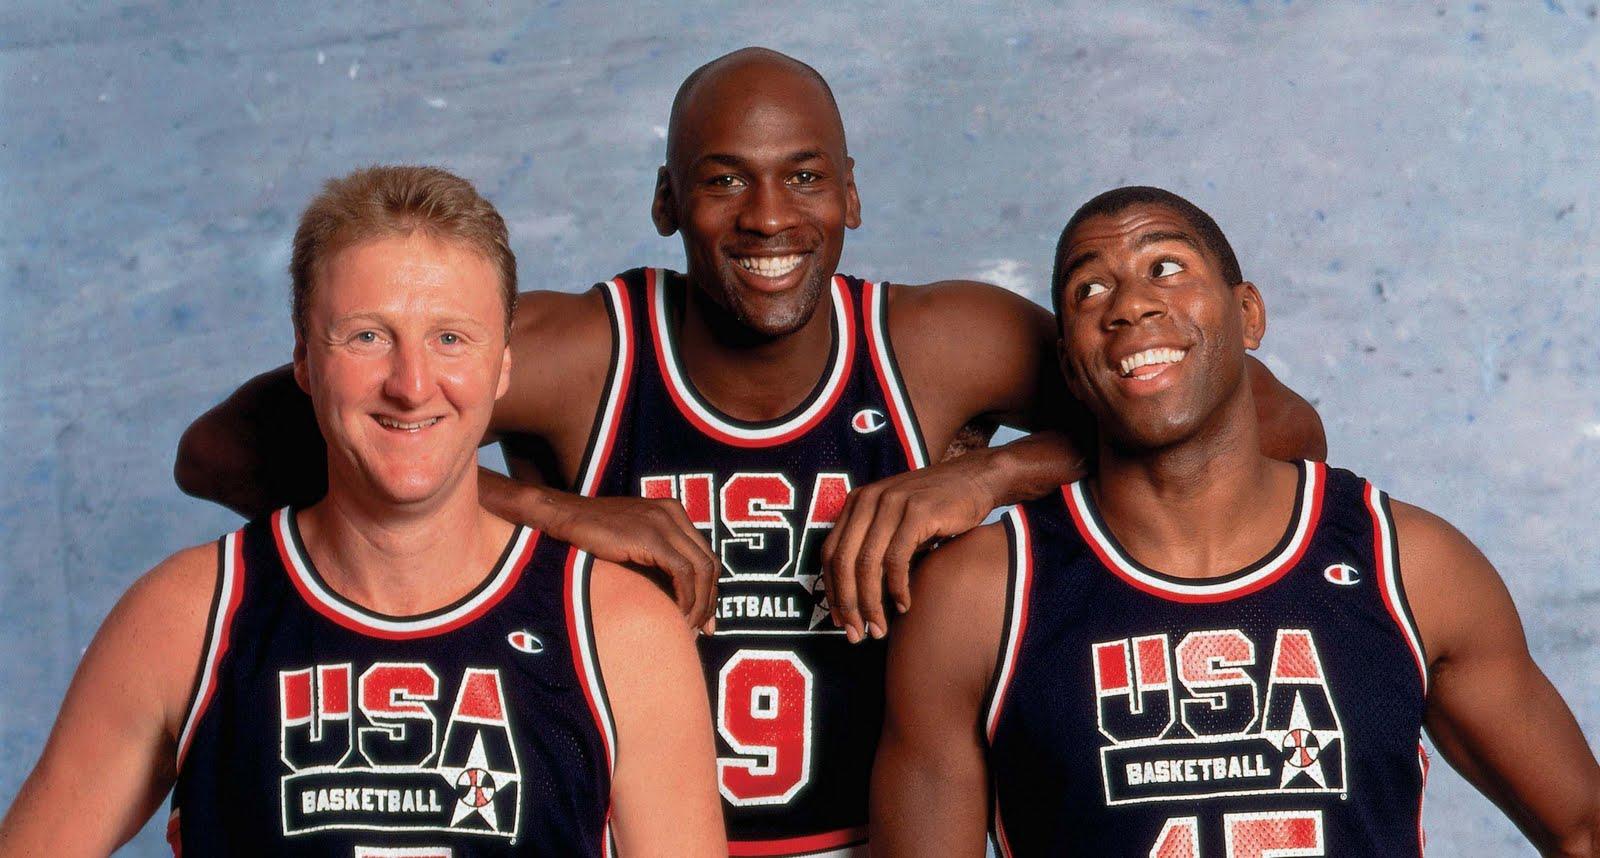 Larry-Bird-Michael-Jordan-and-Magic-Johnson